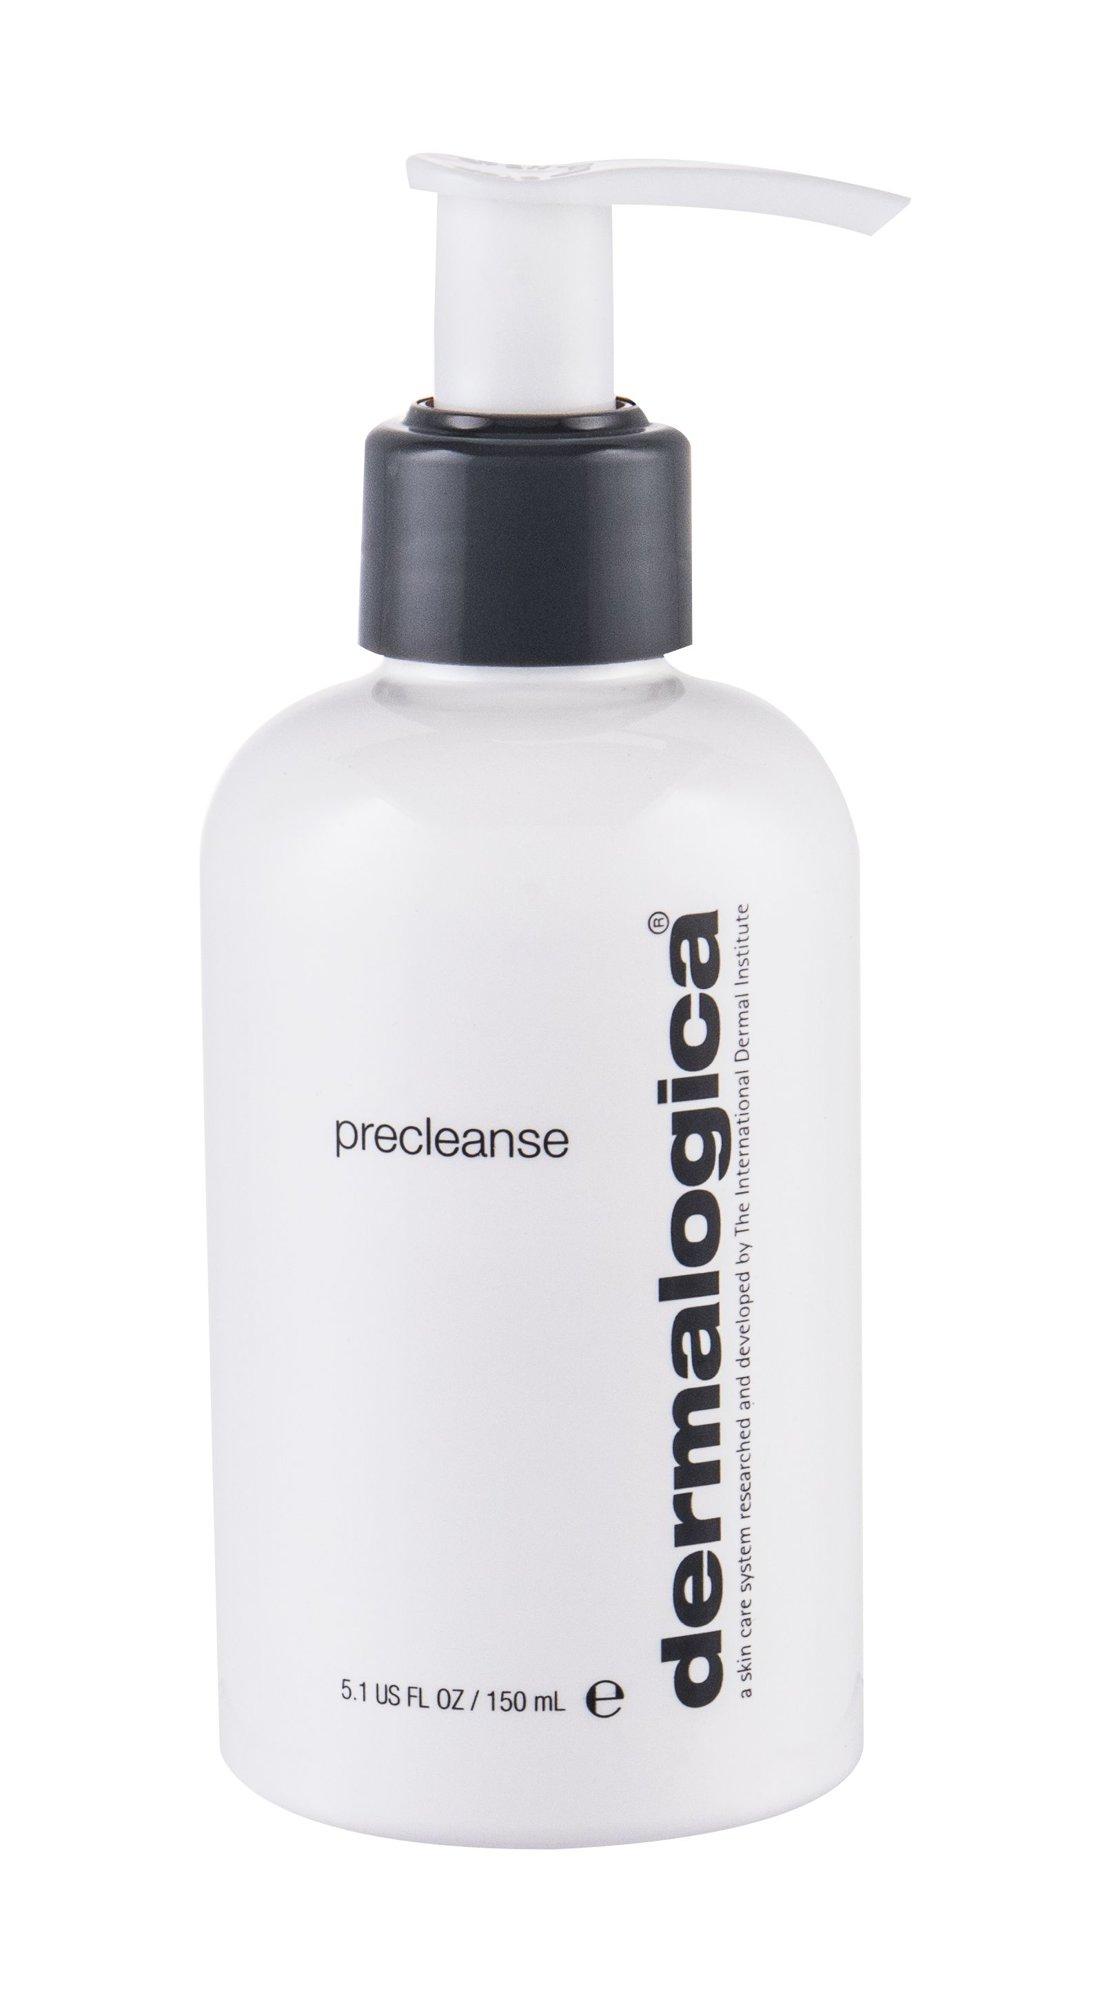 Dermalogica Daily Skin Health Cleansing Oil 150ml  Precleanse